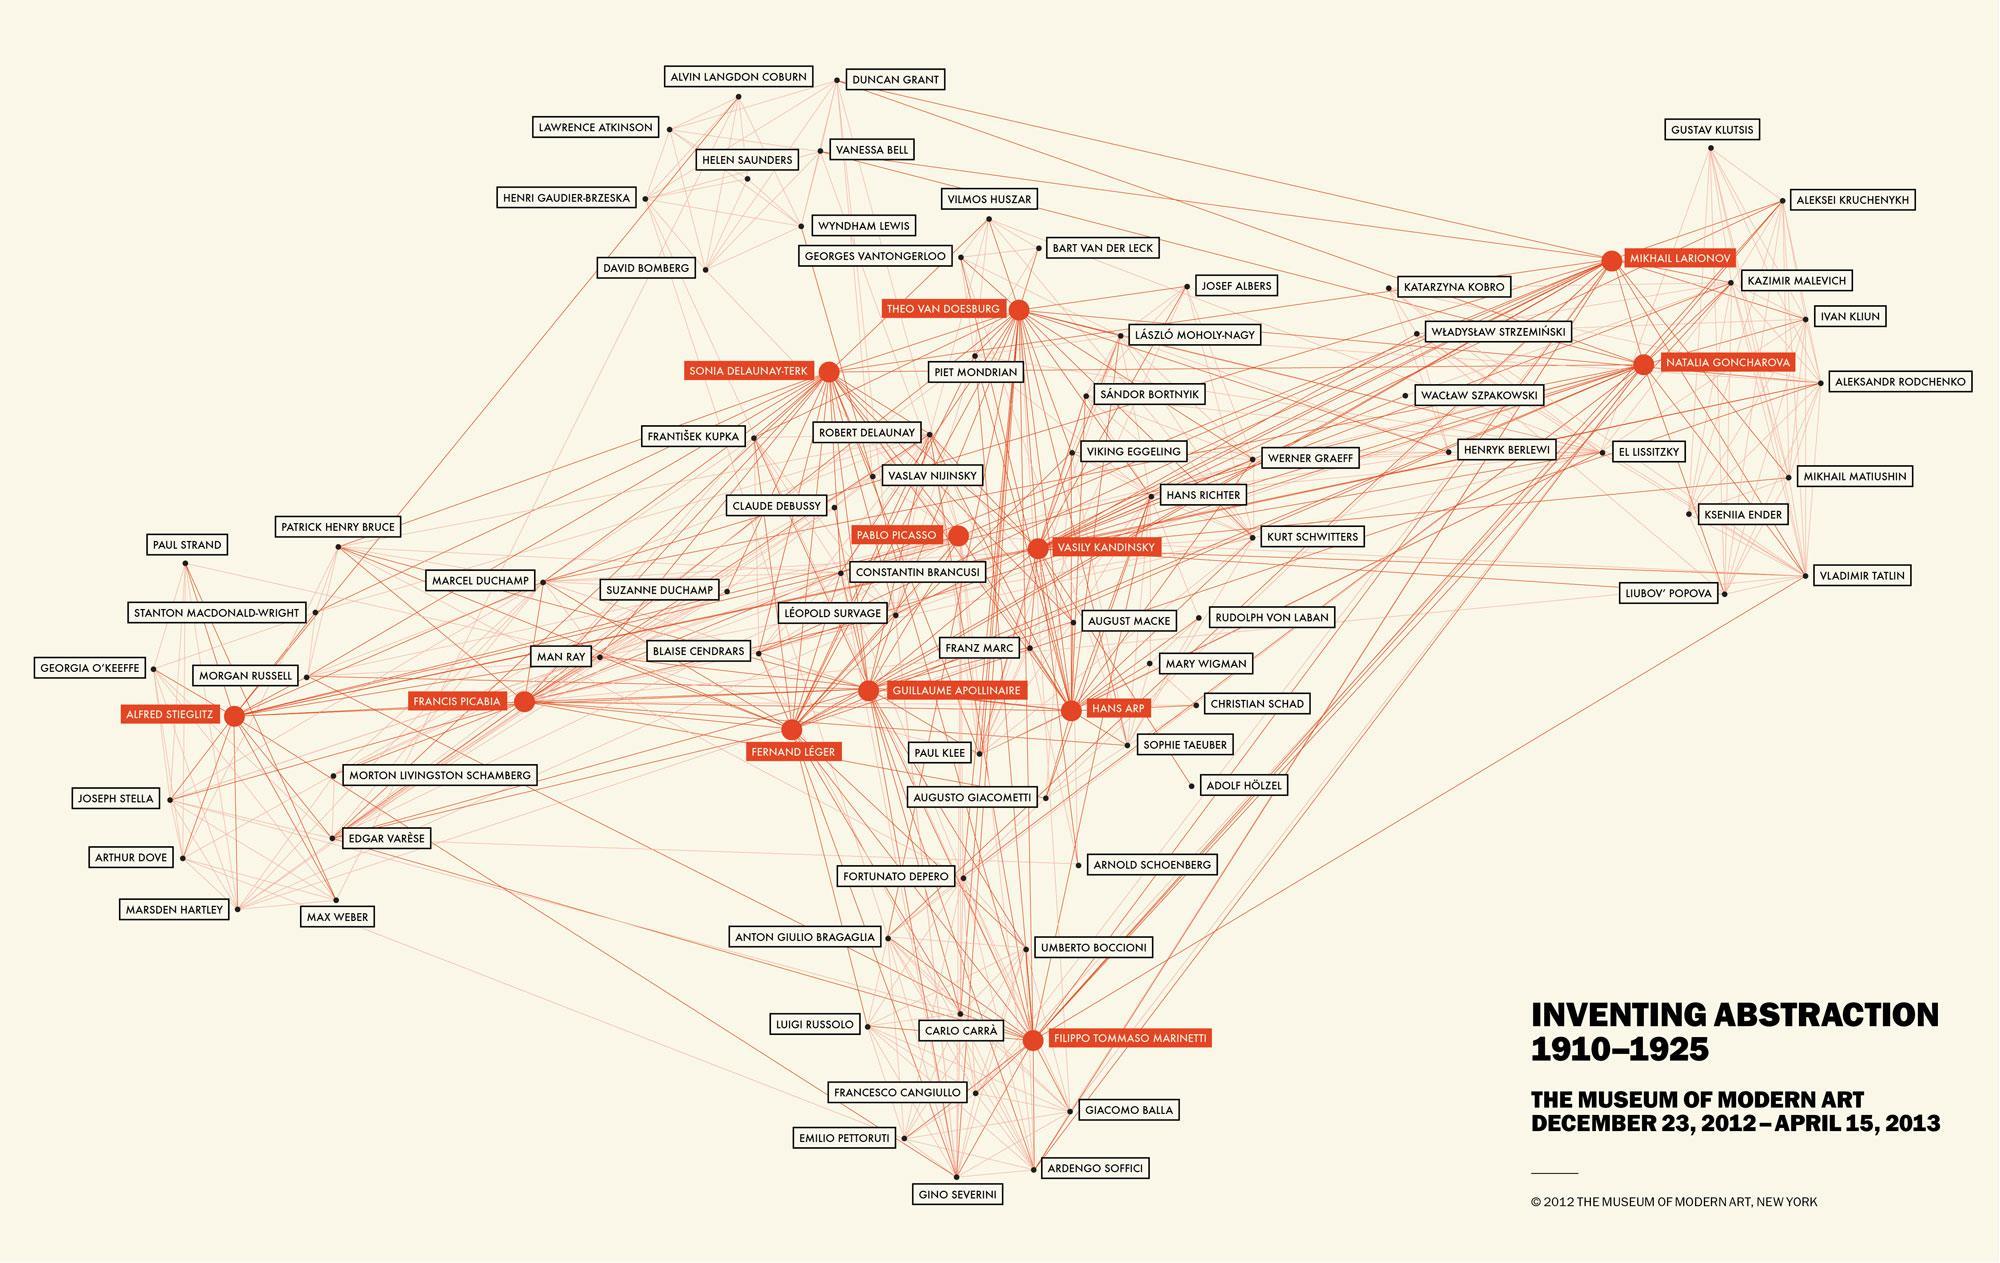 Twentieth Century Female Artists And Data Visualization With Jeffrey39s Log Mp3 Player Circuit Diagram Undergrads